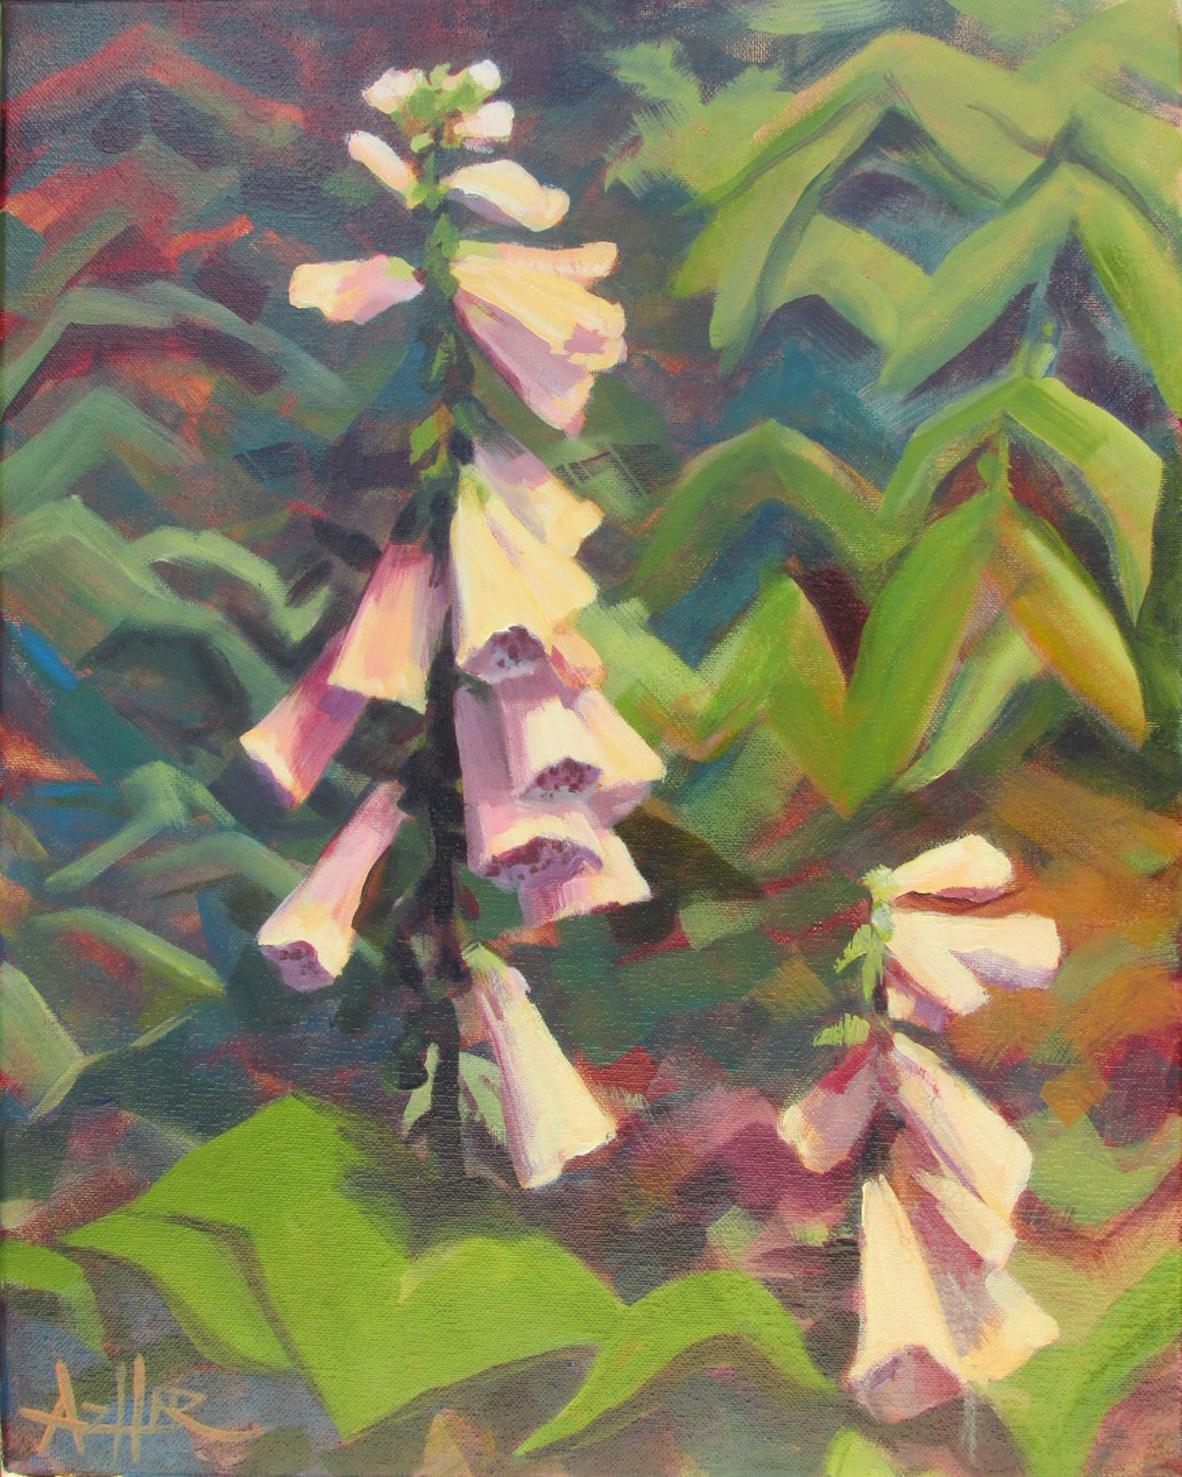 SOLD, Foxgloves, Oil on Canvas, Copyright 2017 Hirschten